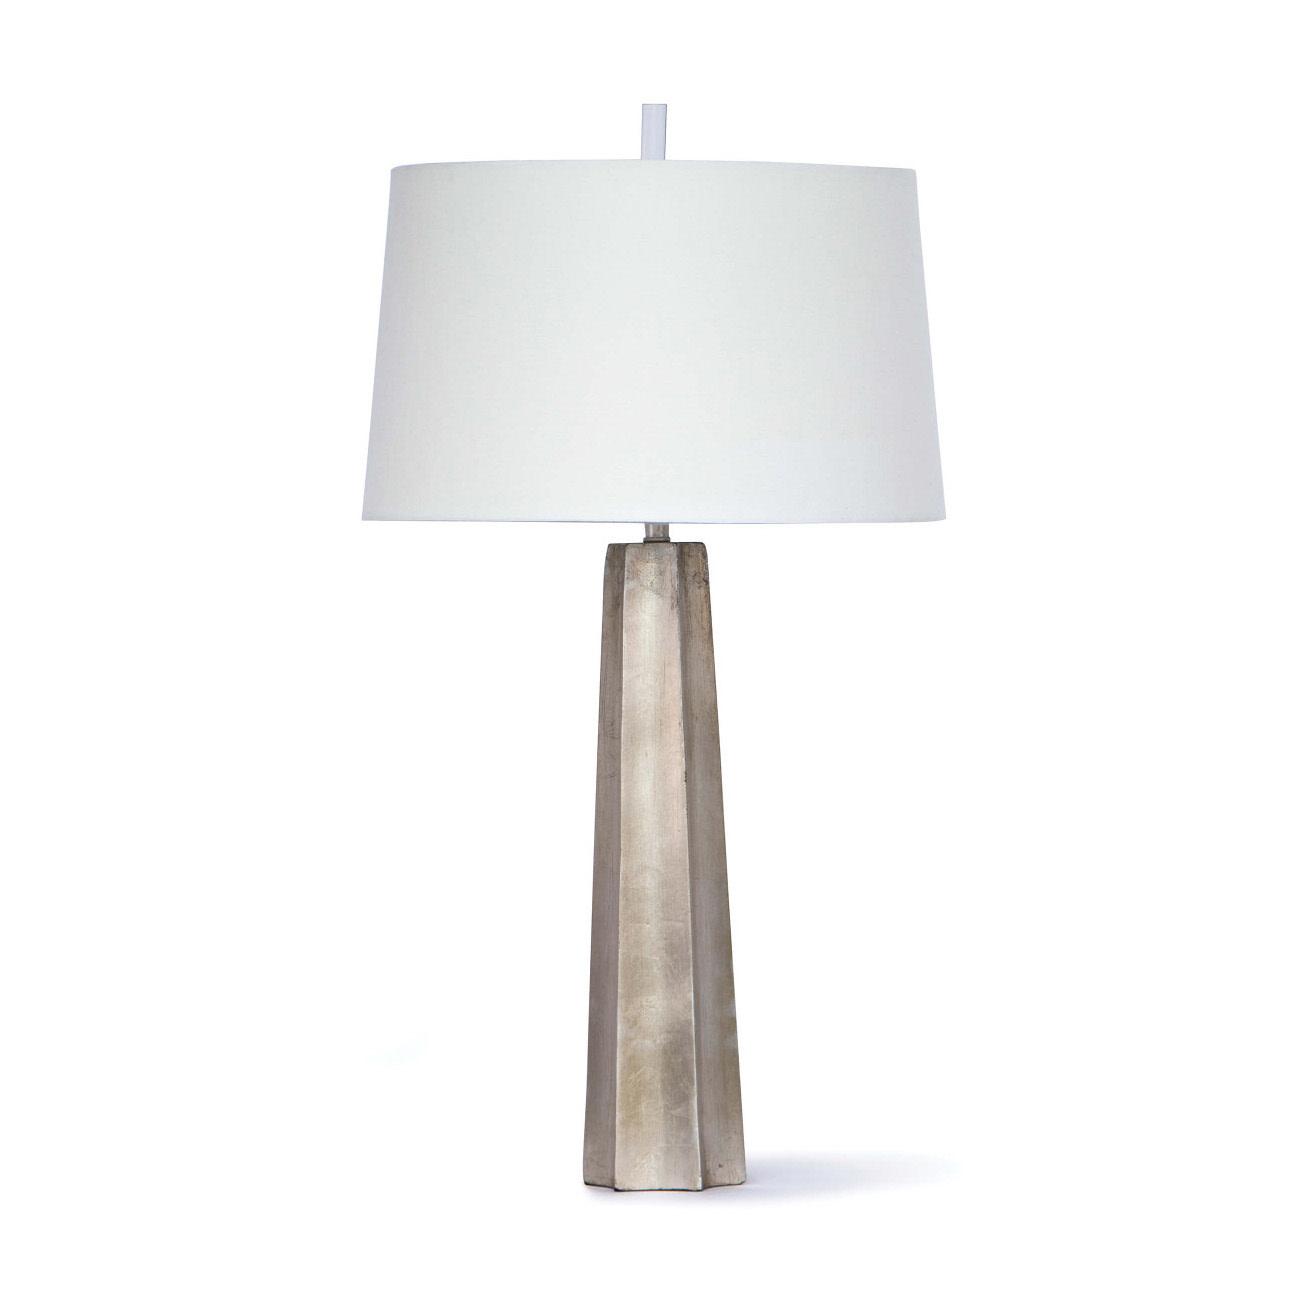 Celine Table Lamp by Regina Andrew